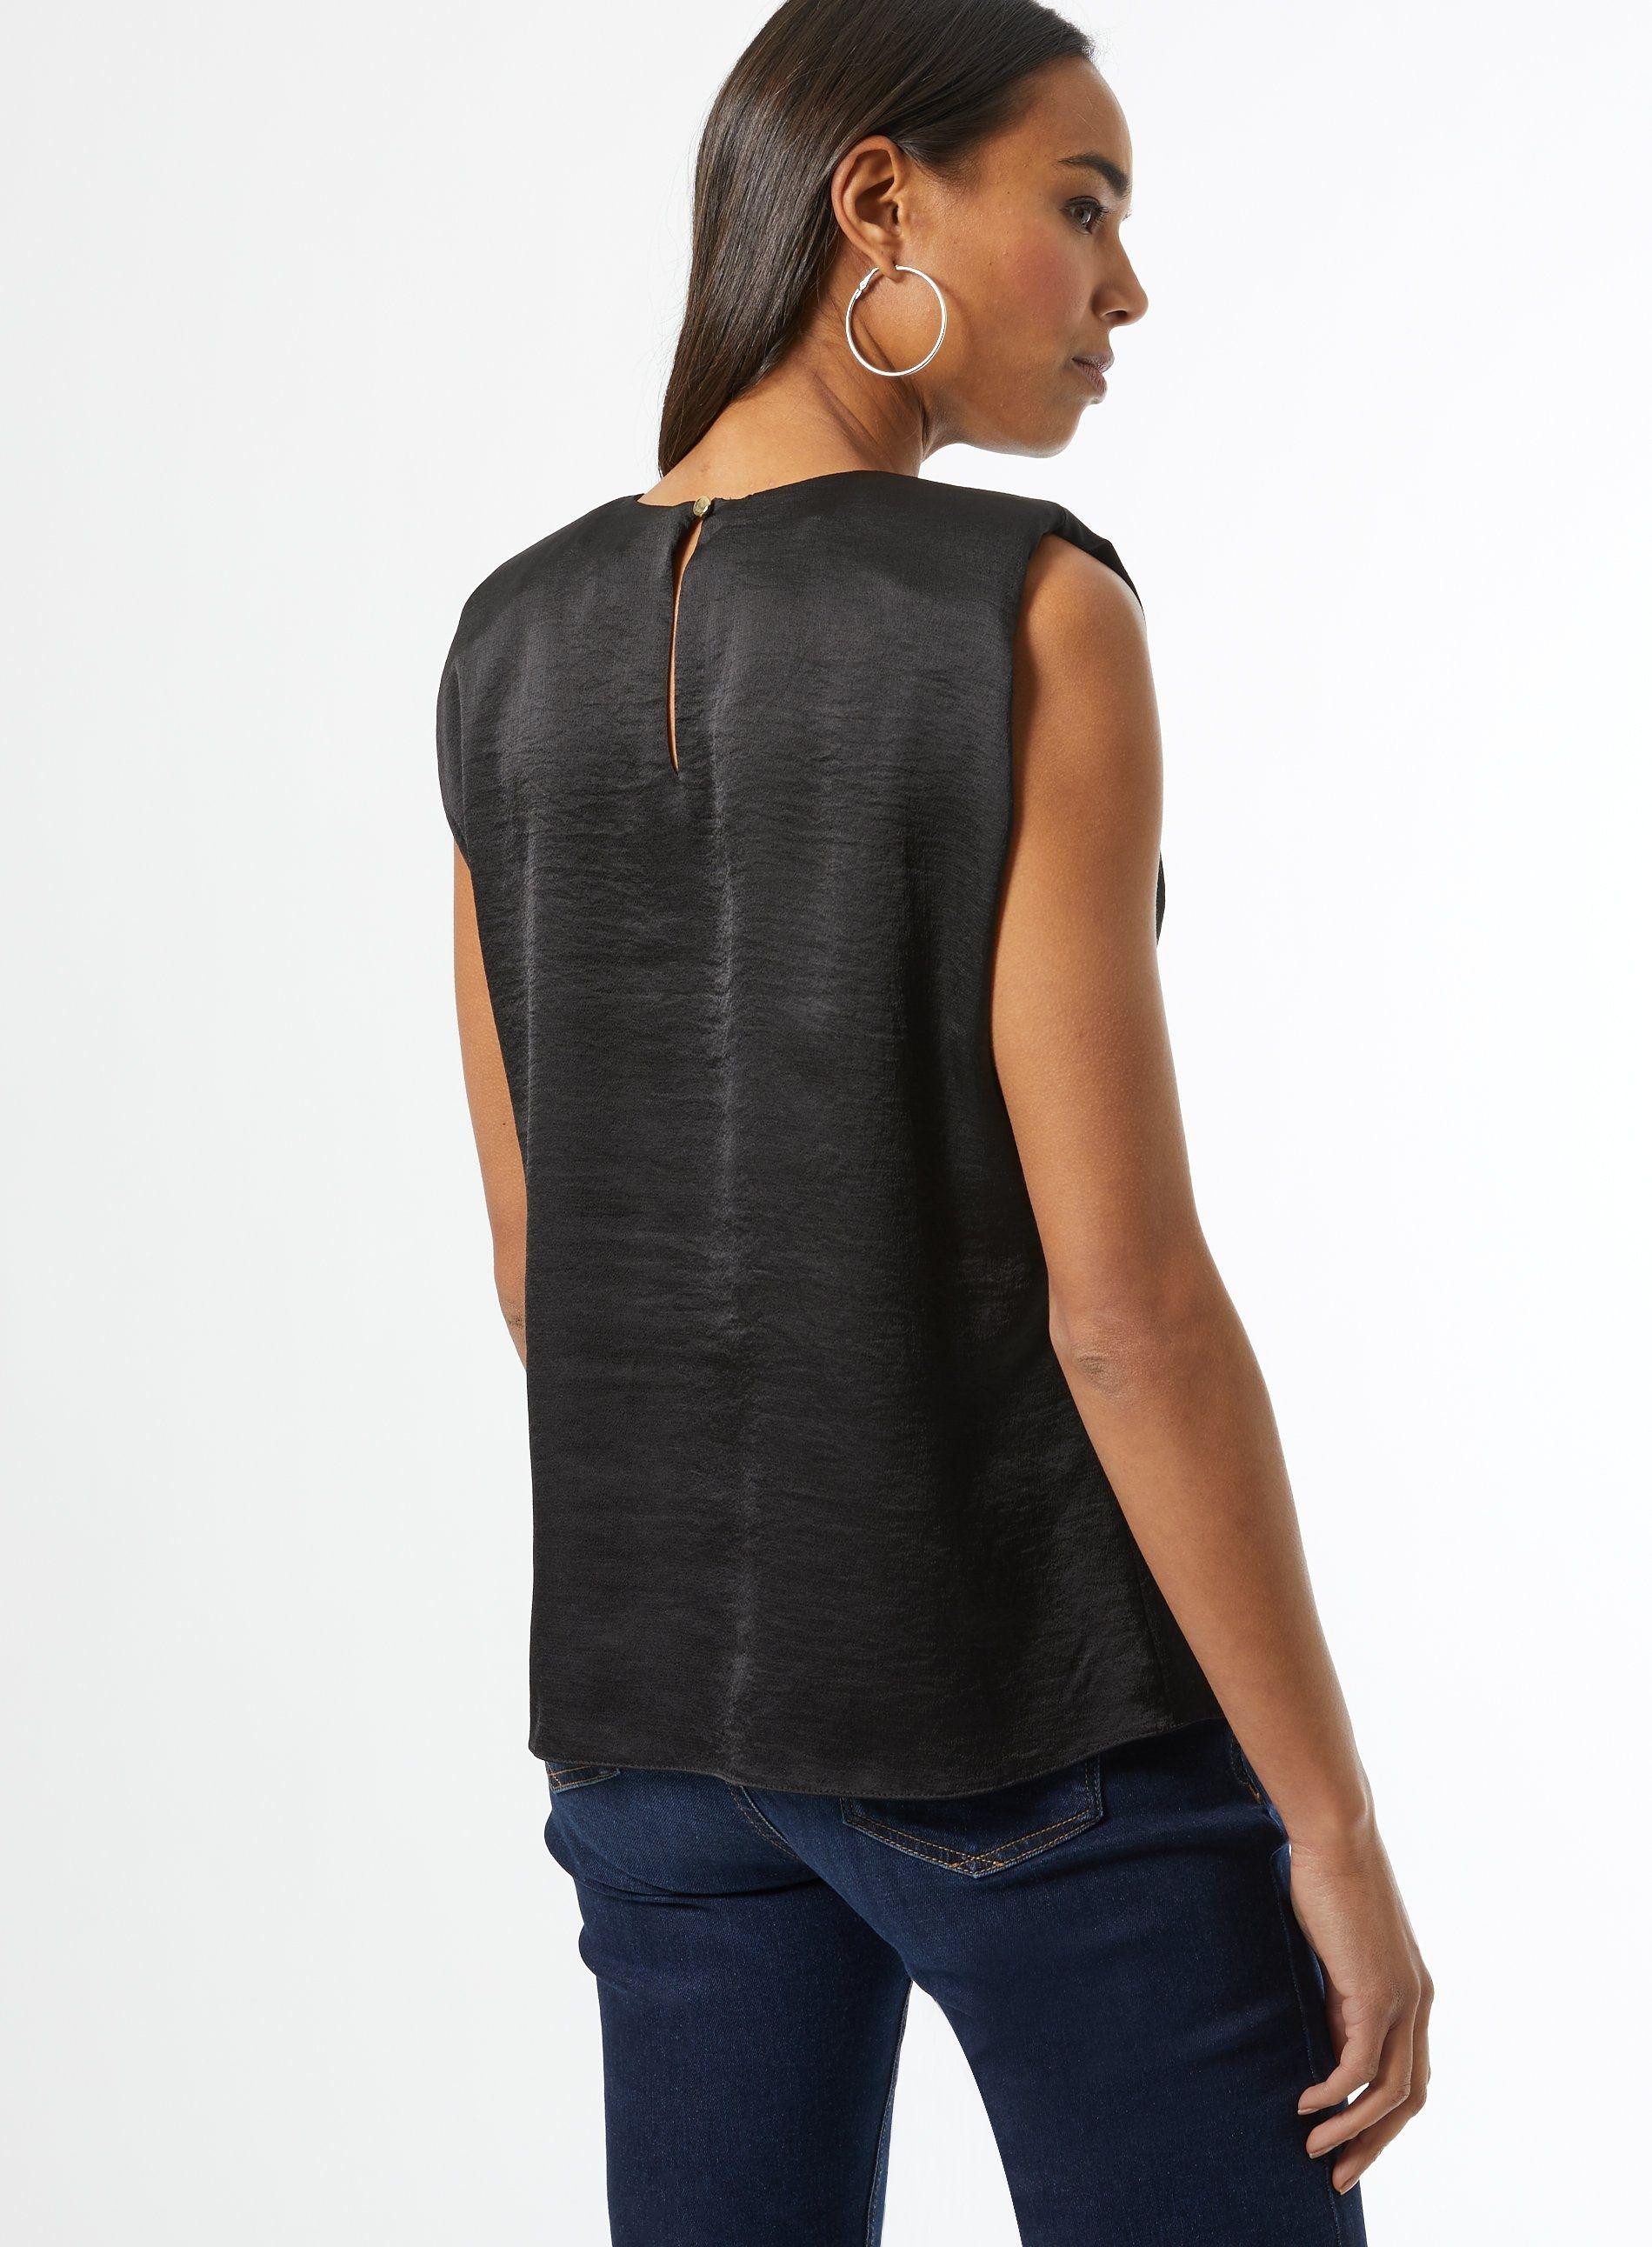 Dorothy Perkins Womens Black Shoulder Pad Sleeveless Top Blouse